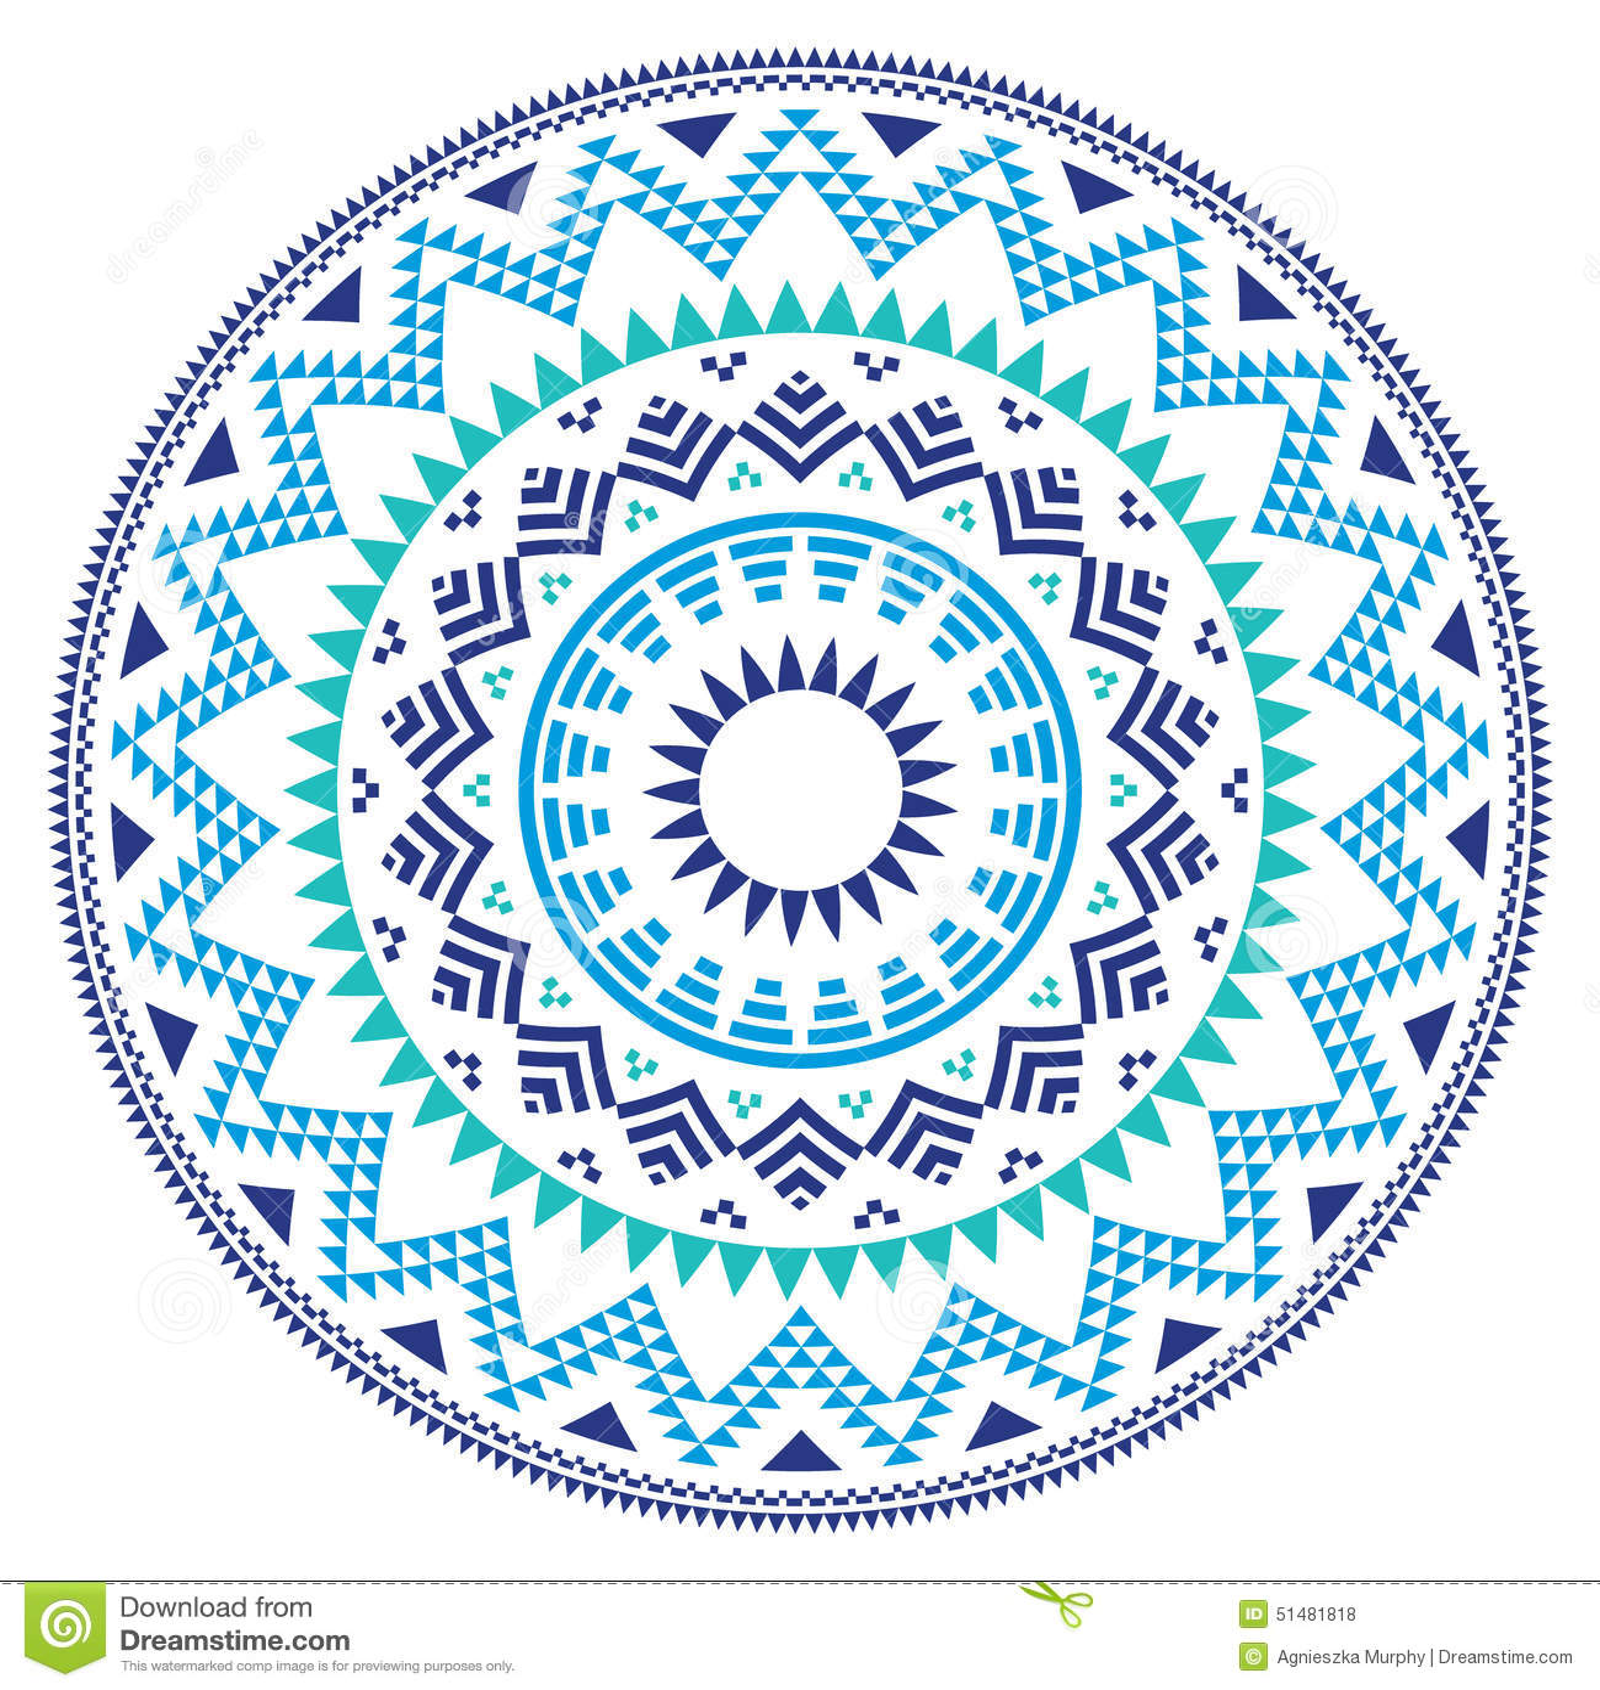 Scandanavian Designs Tribal Folk Aztec Geometric Pattern In Circle Blue Navy